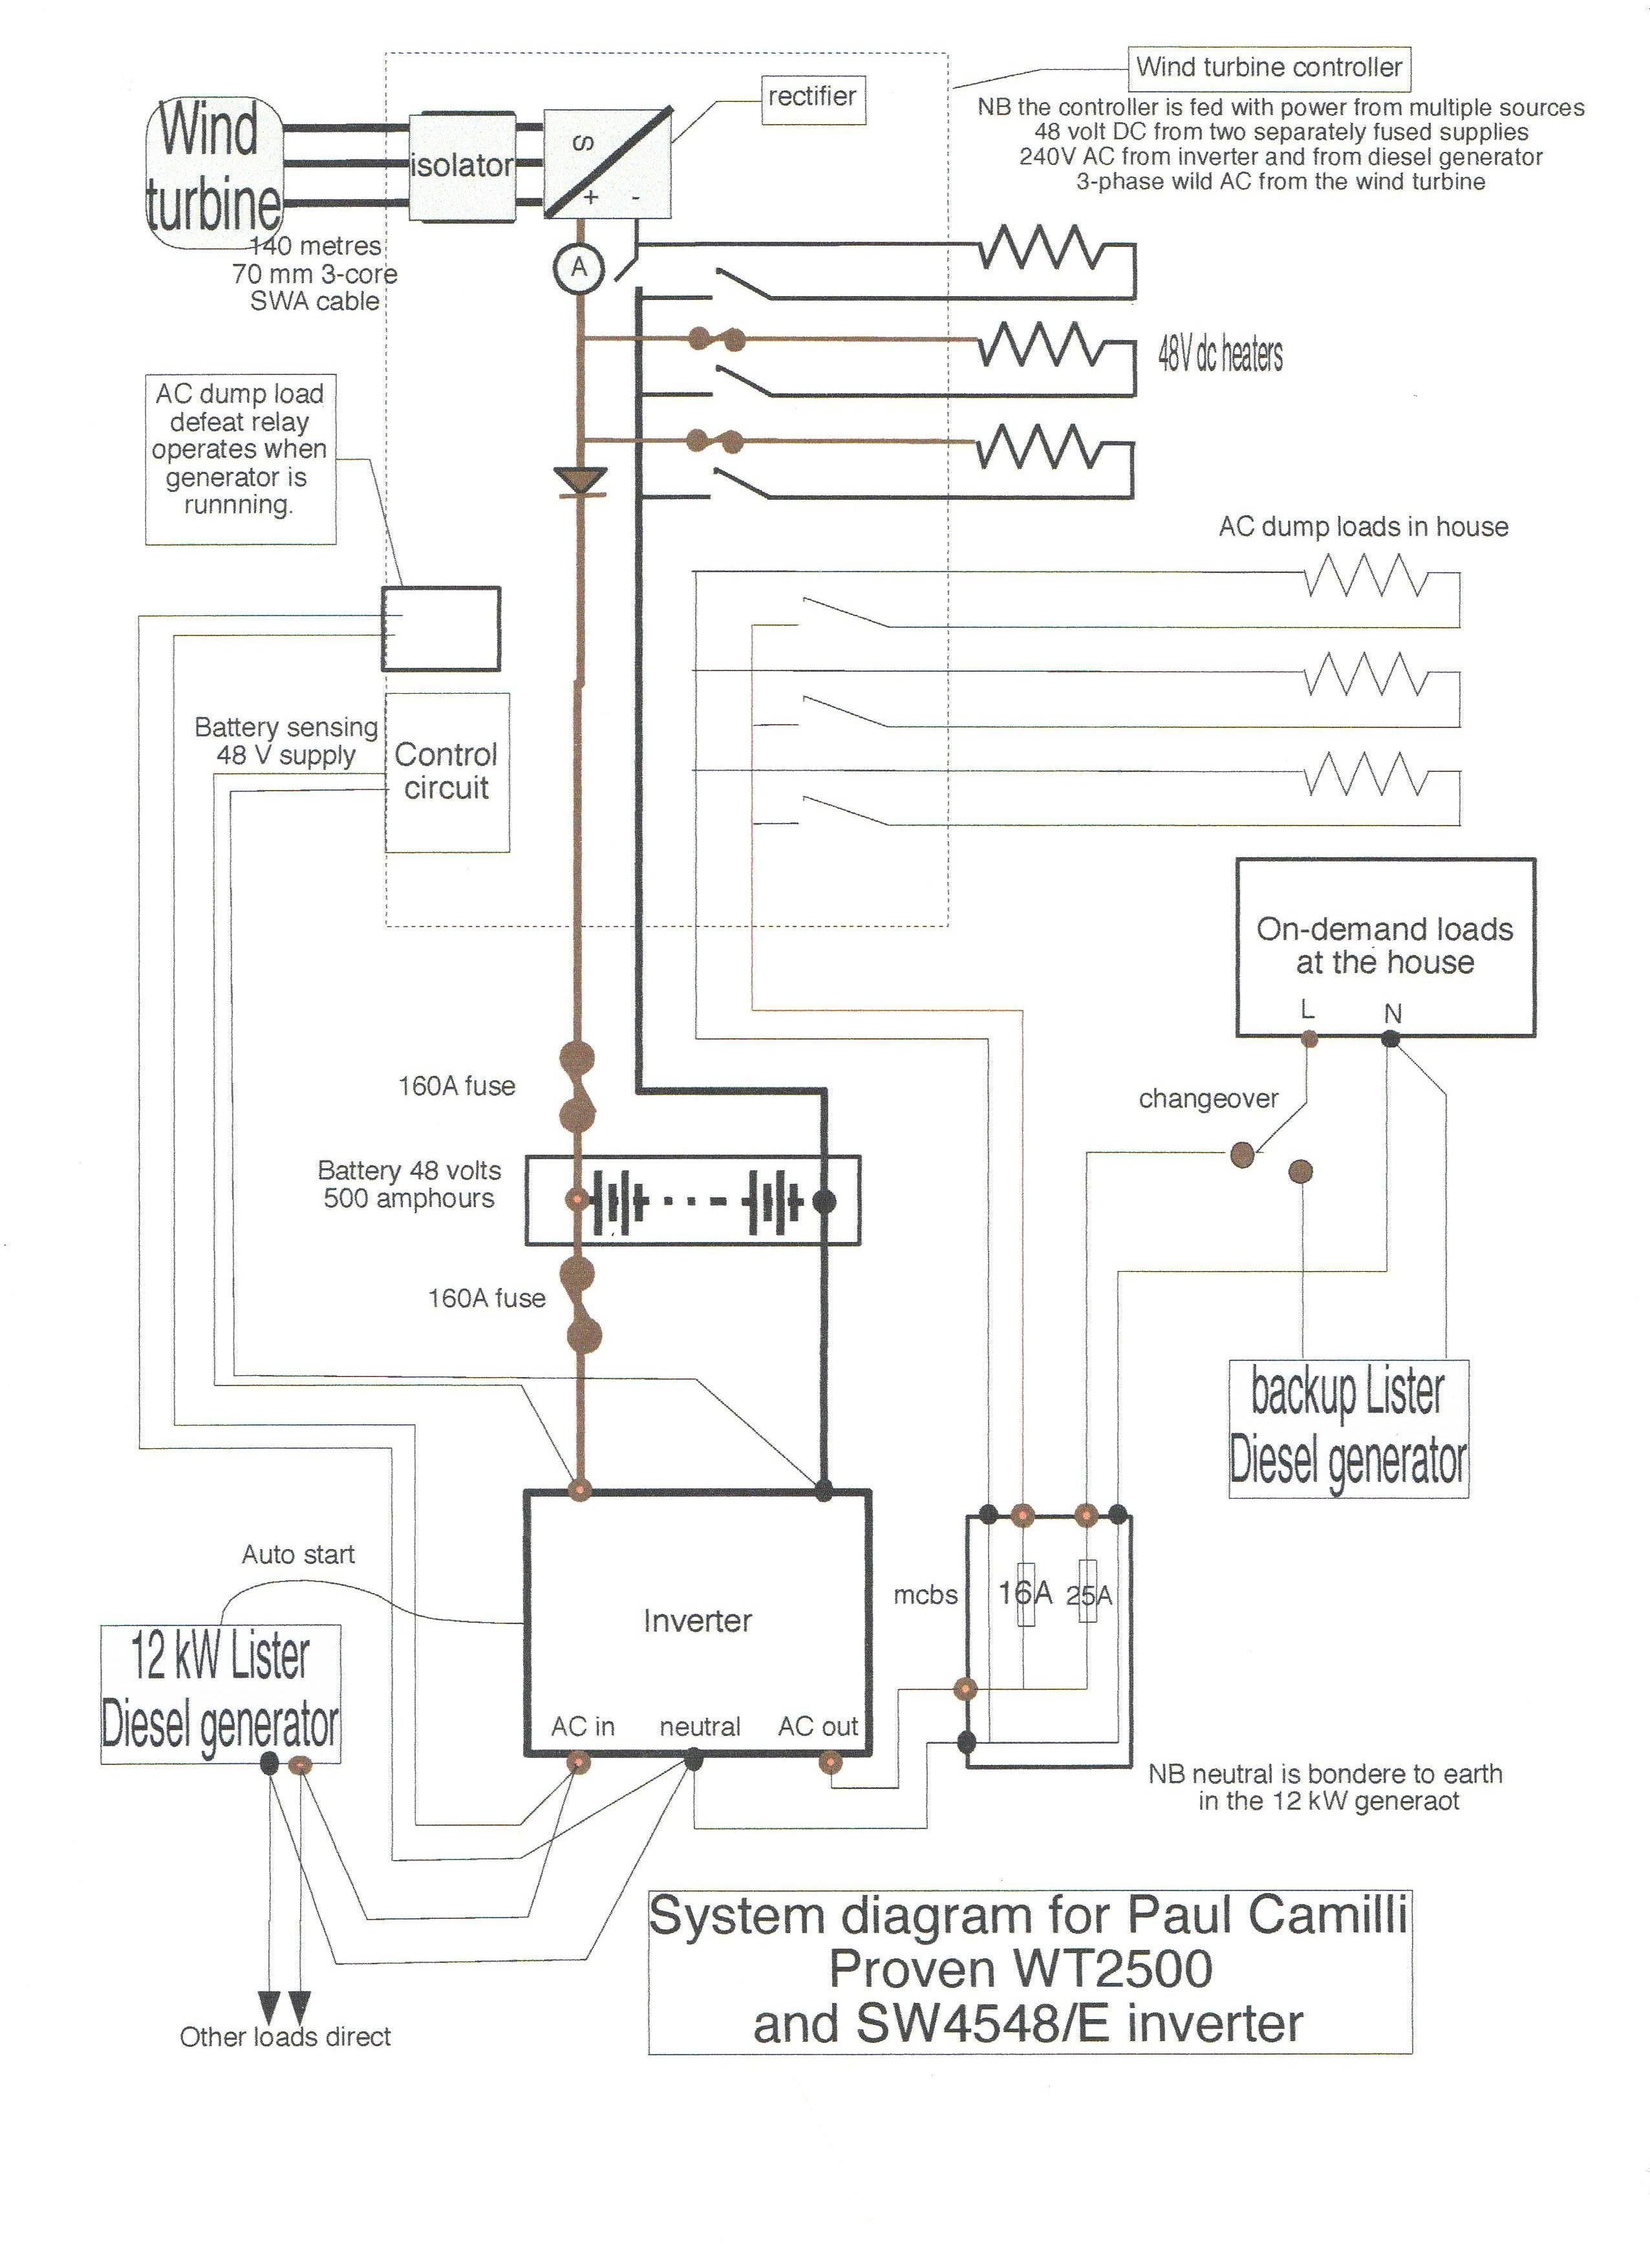 Maytag Dryer Sdg515daww Wiring Diagrams Wind Turbine Wind Power Turbine